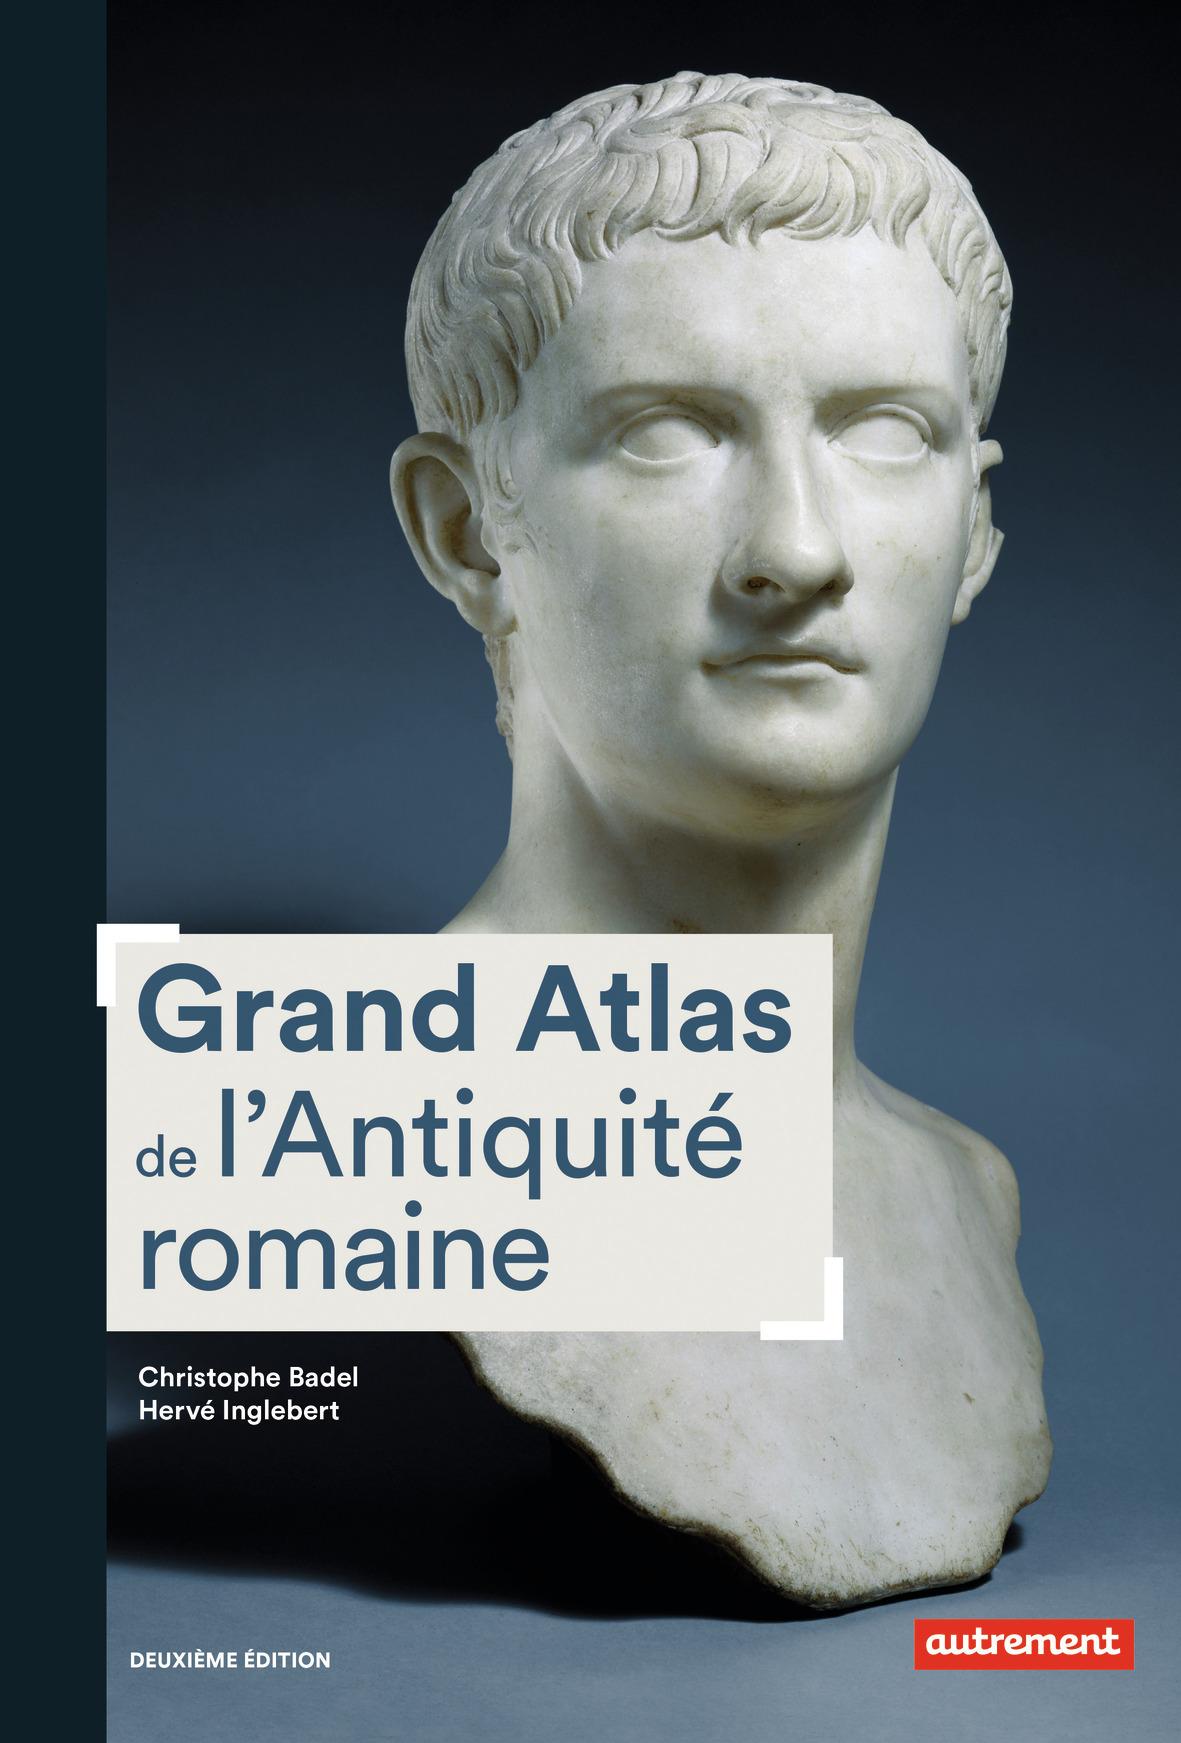 GRAND ATLAS DE L'ANTIQUITE ROMAINE - IIIE SIECLE AV. J.-C.-VIE SIECLE APR. J.-C.